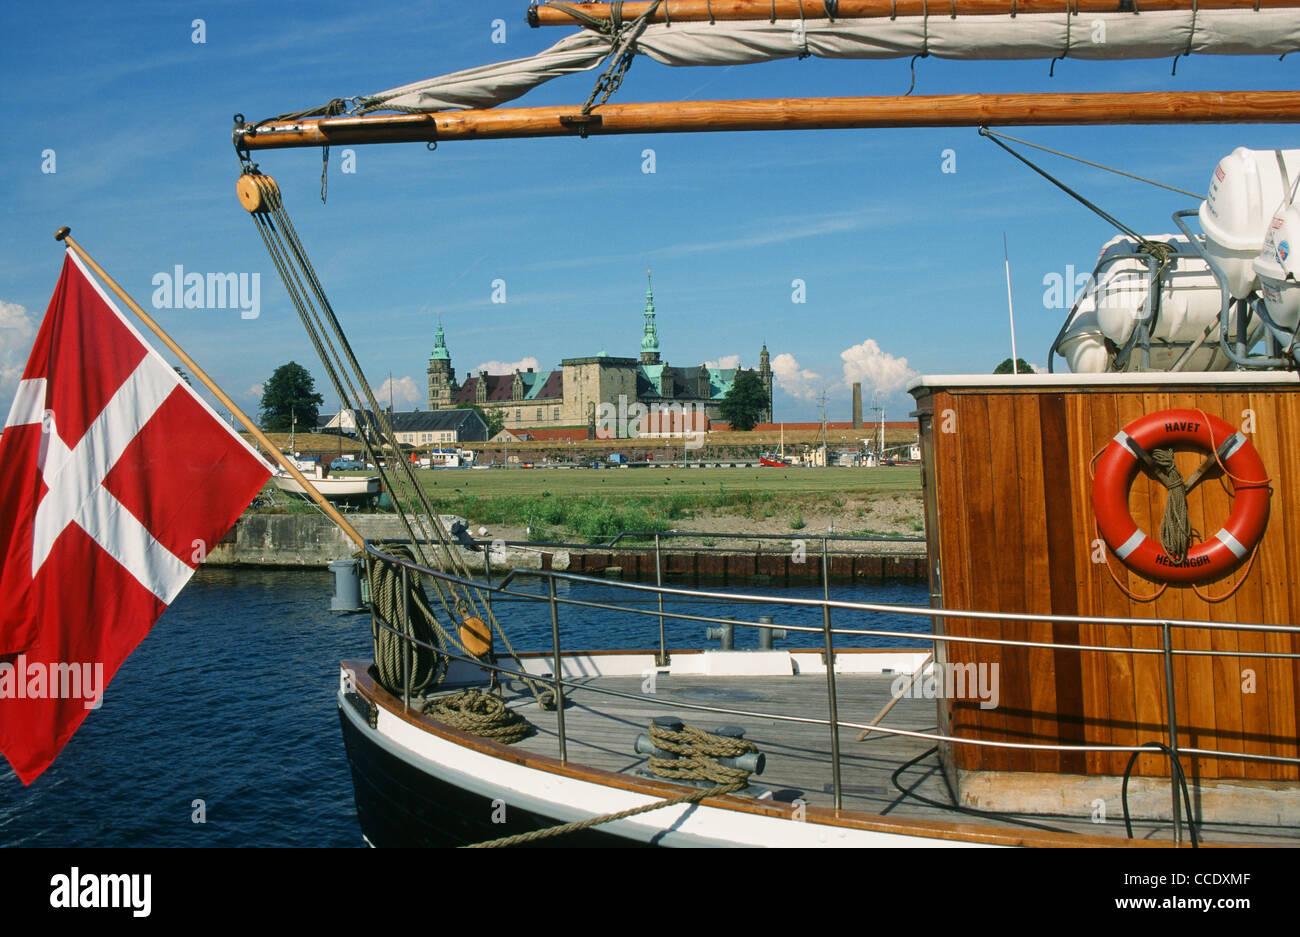 Kronborg castle at Helsingor on the island of Sealand in Denmark - Stock Image